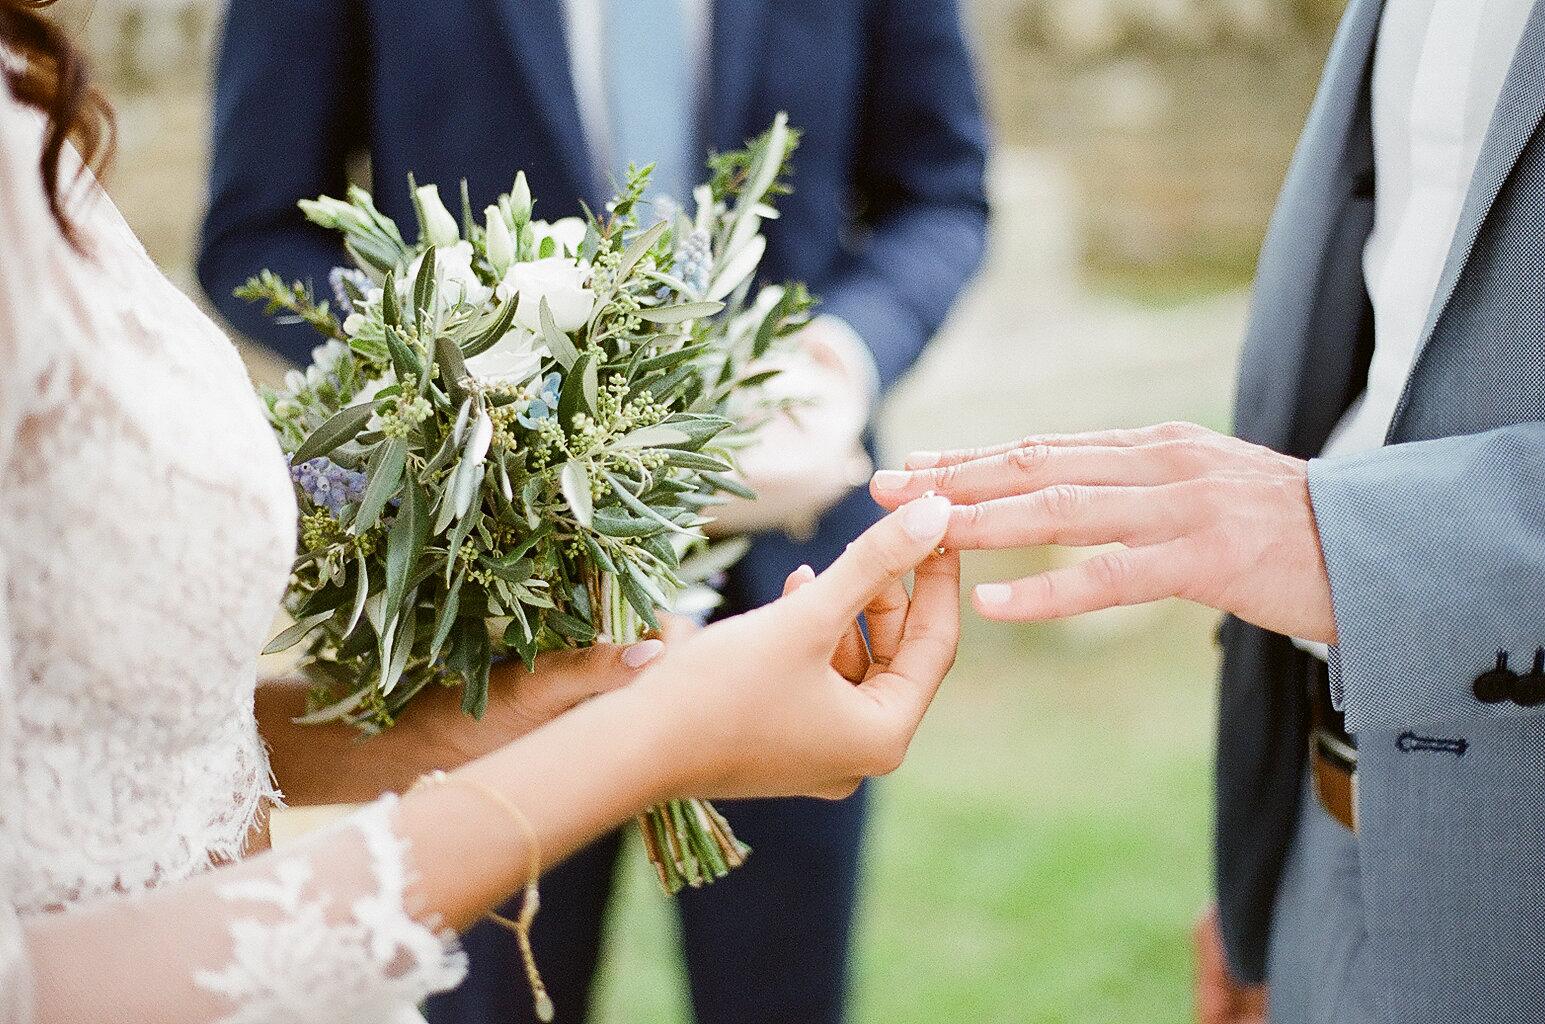 le coeur dans les etoiles - wedding planner - provence - luberon - alpilles - drome - vaucluse - sardaigne - italie - organisation - mariage - shooting - dolce vita - valery villard-300